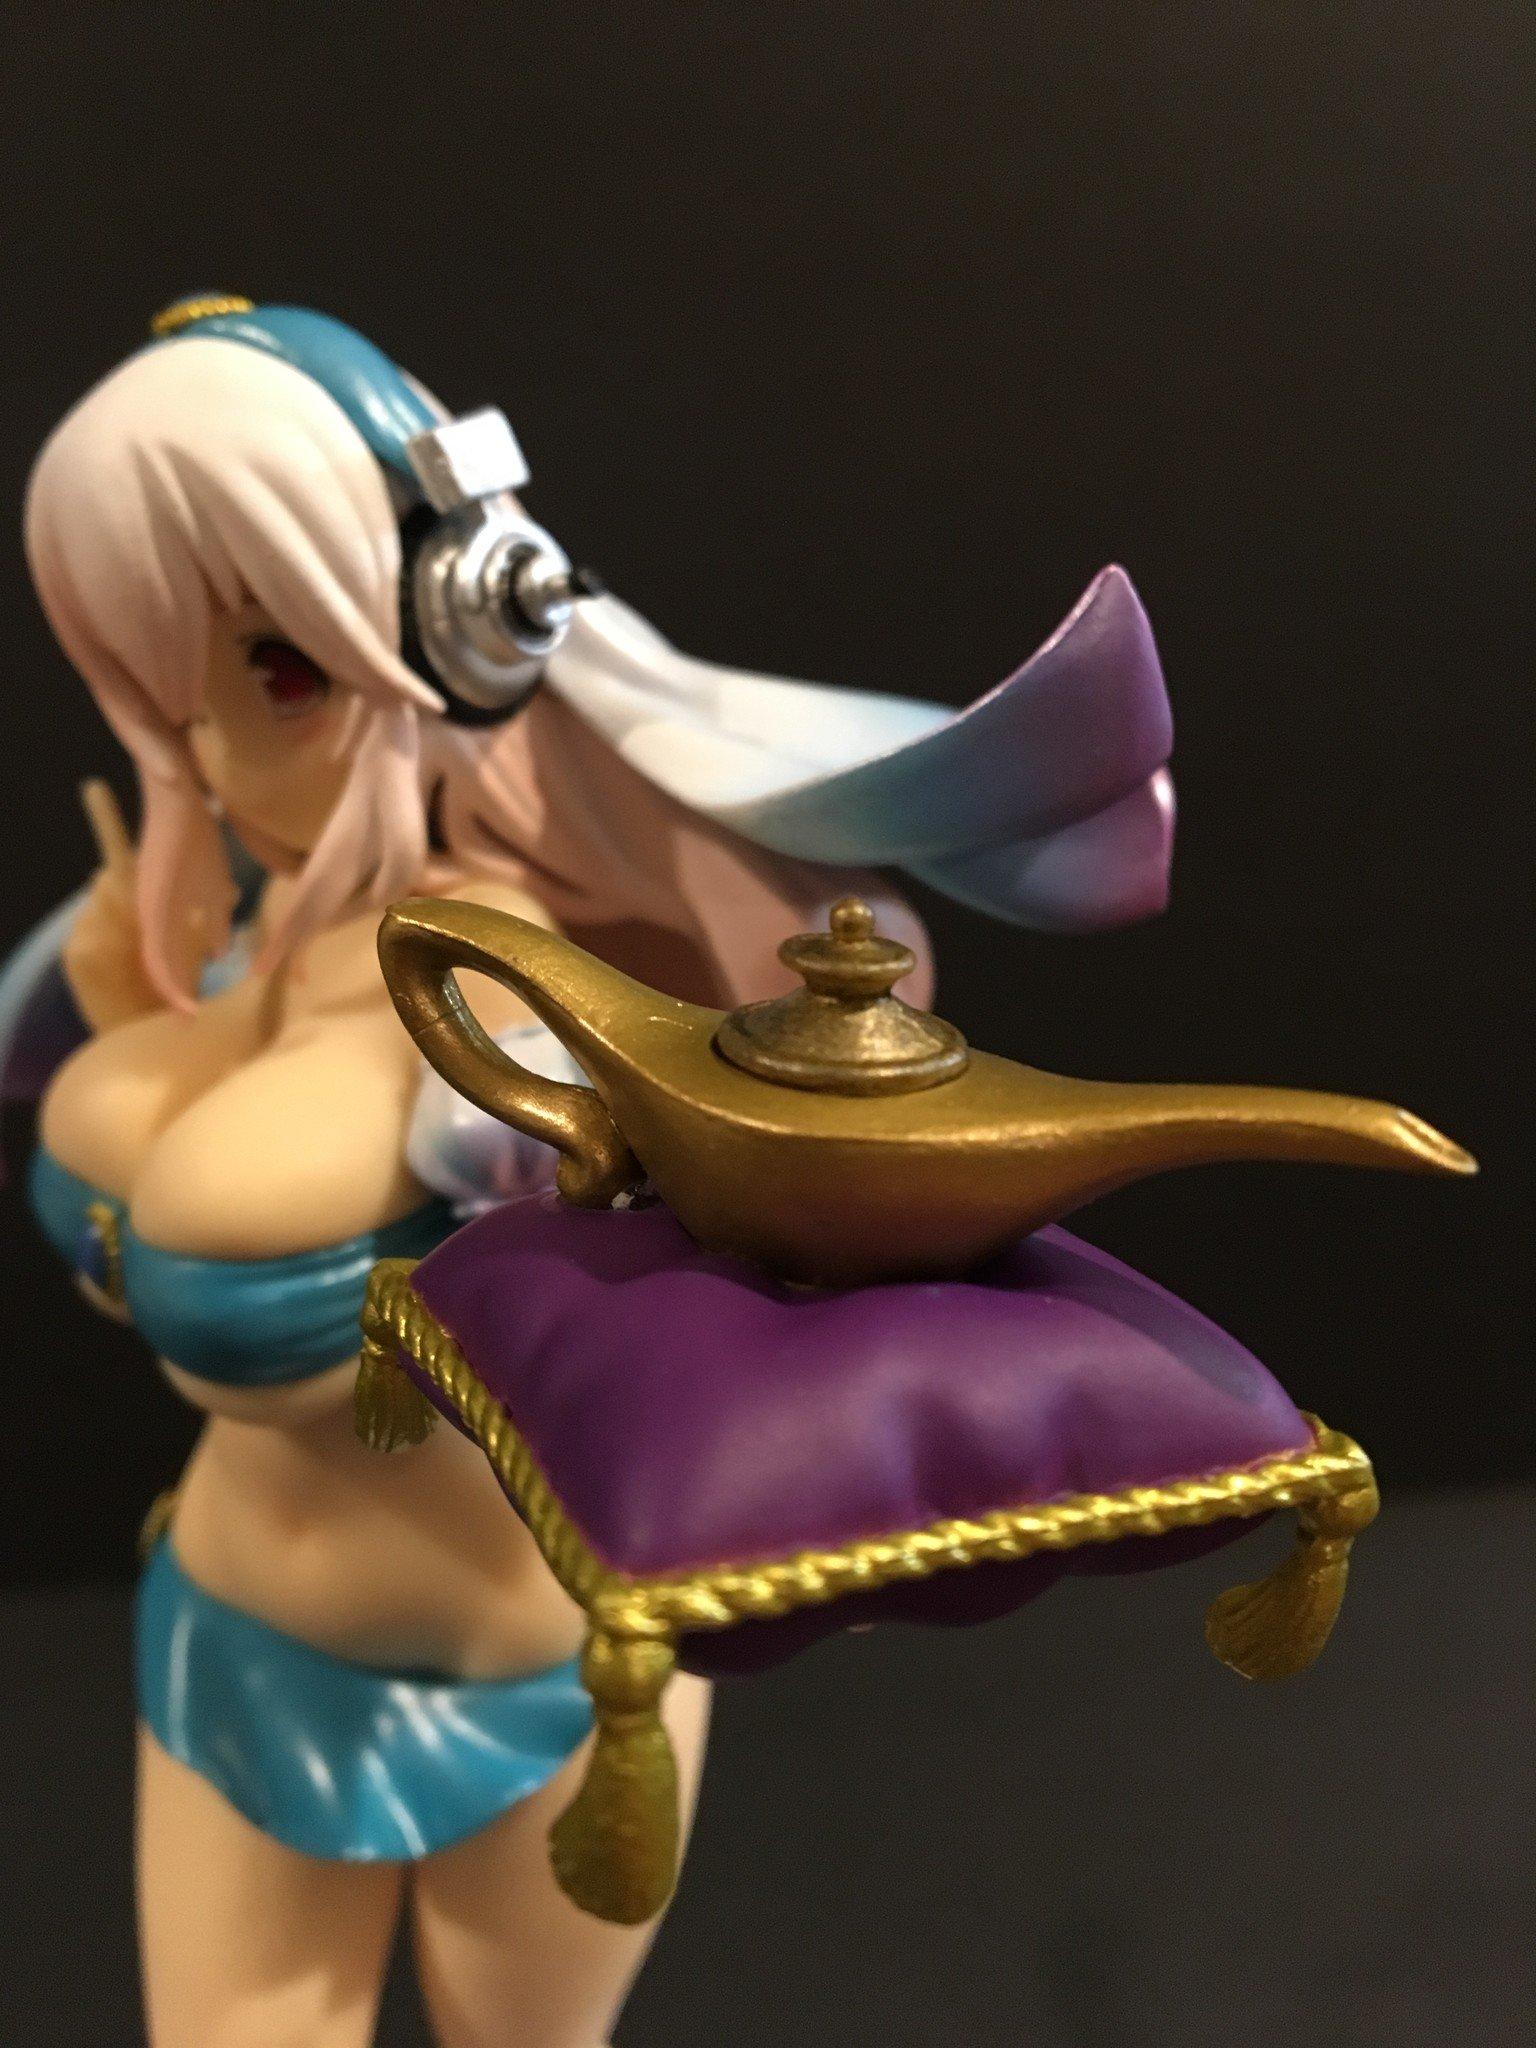 Super Sonico SSS Genie of The Lamp Fairy Tale Figure Furyu